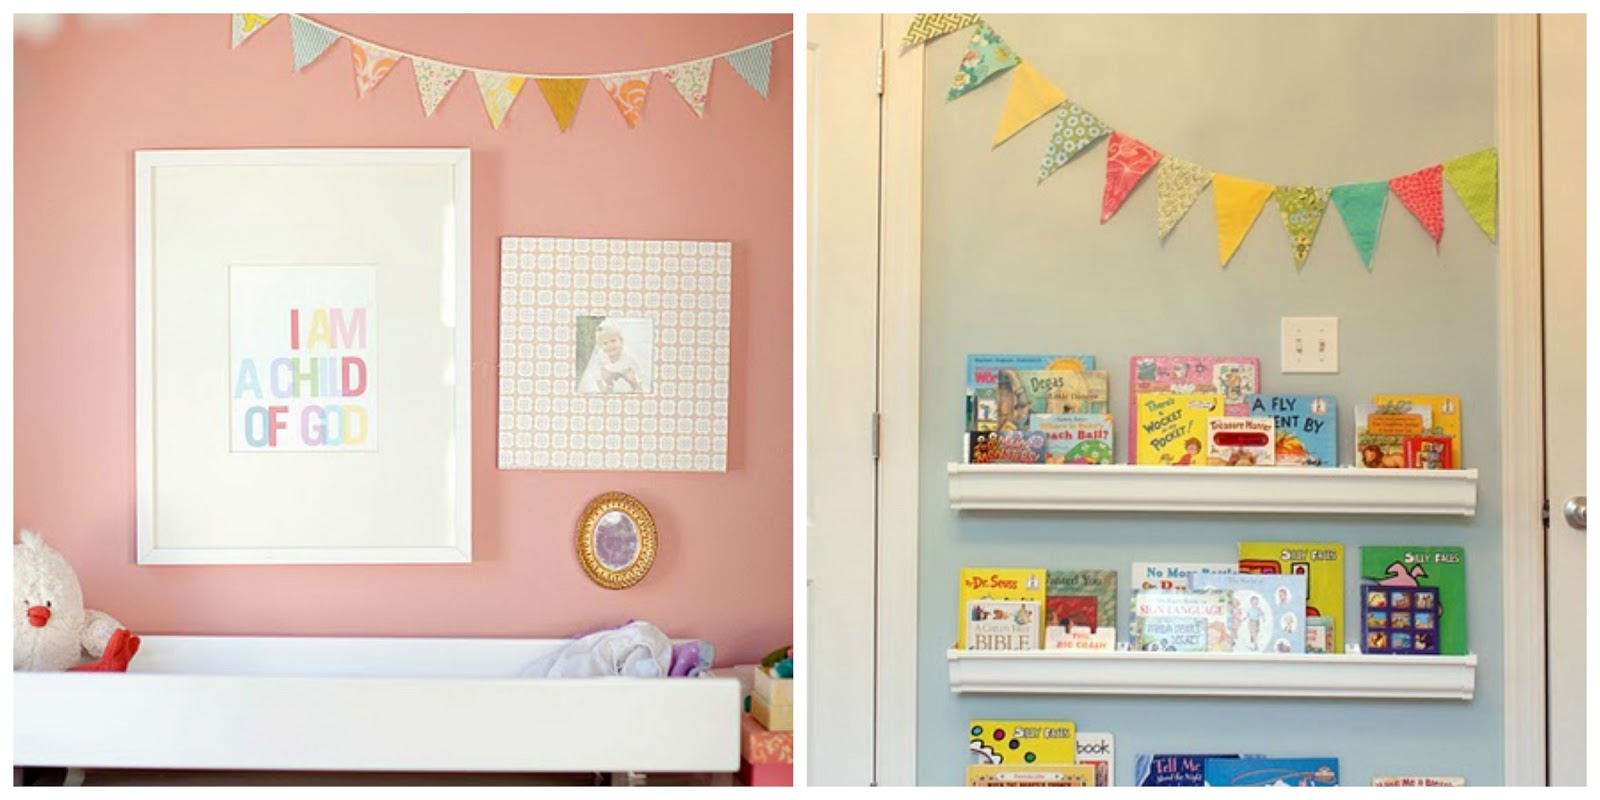 Decoracion infantil kids decor m s alla del rosa o azul - Ideas decoracion habitacion infantil ...